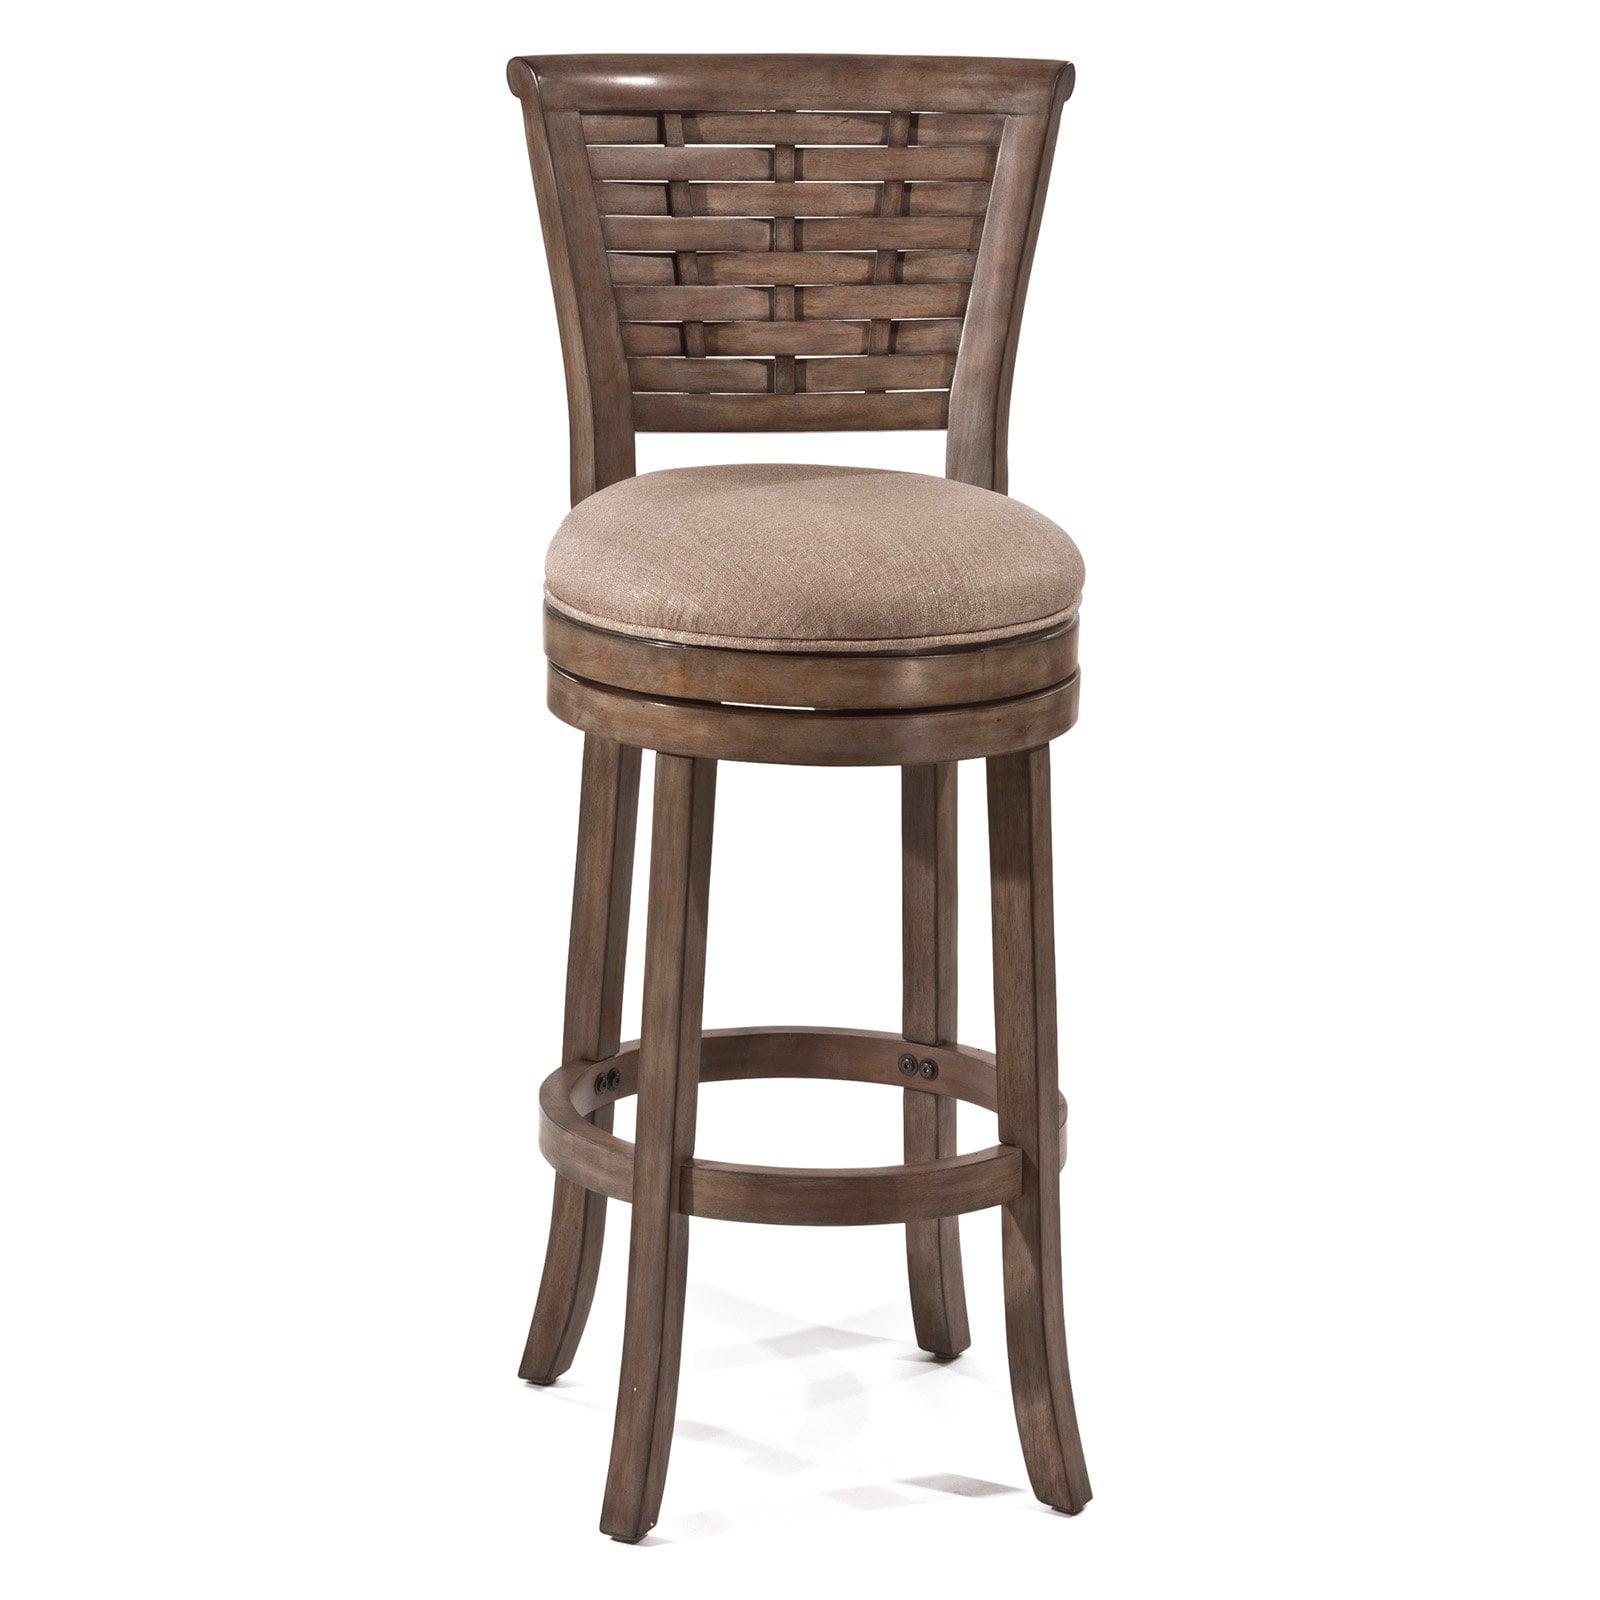 Thredson Swivel Bar Stool, Light Antique Graywash Finish by Hillsdale Furniture